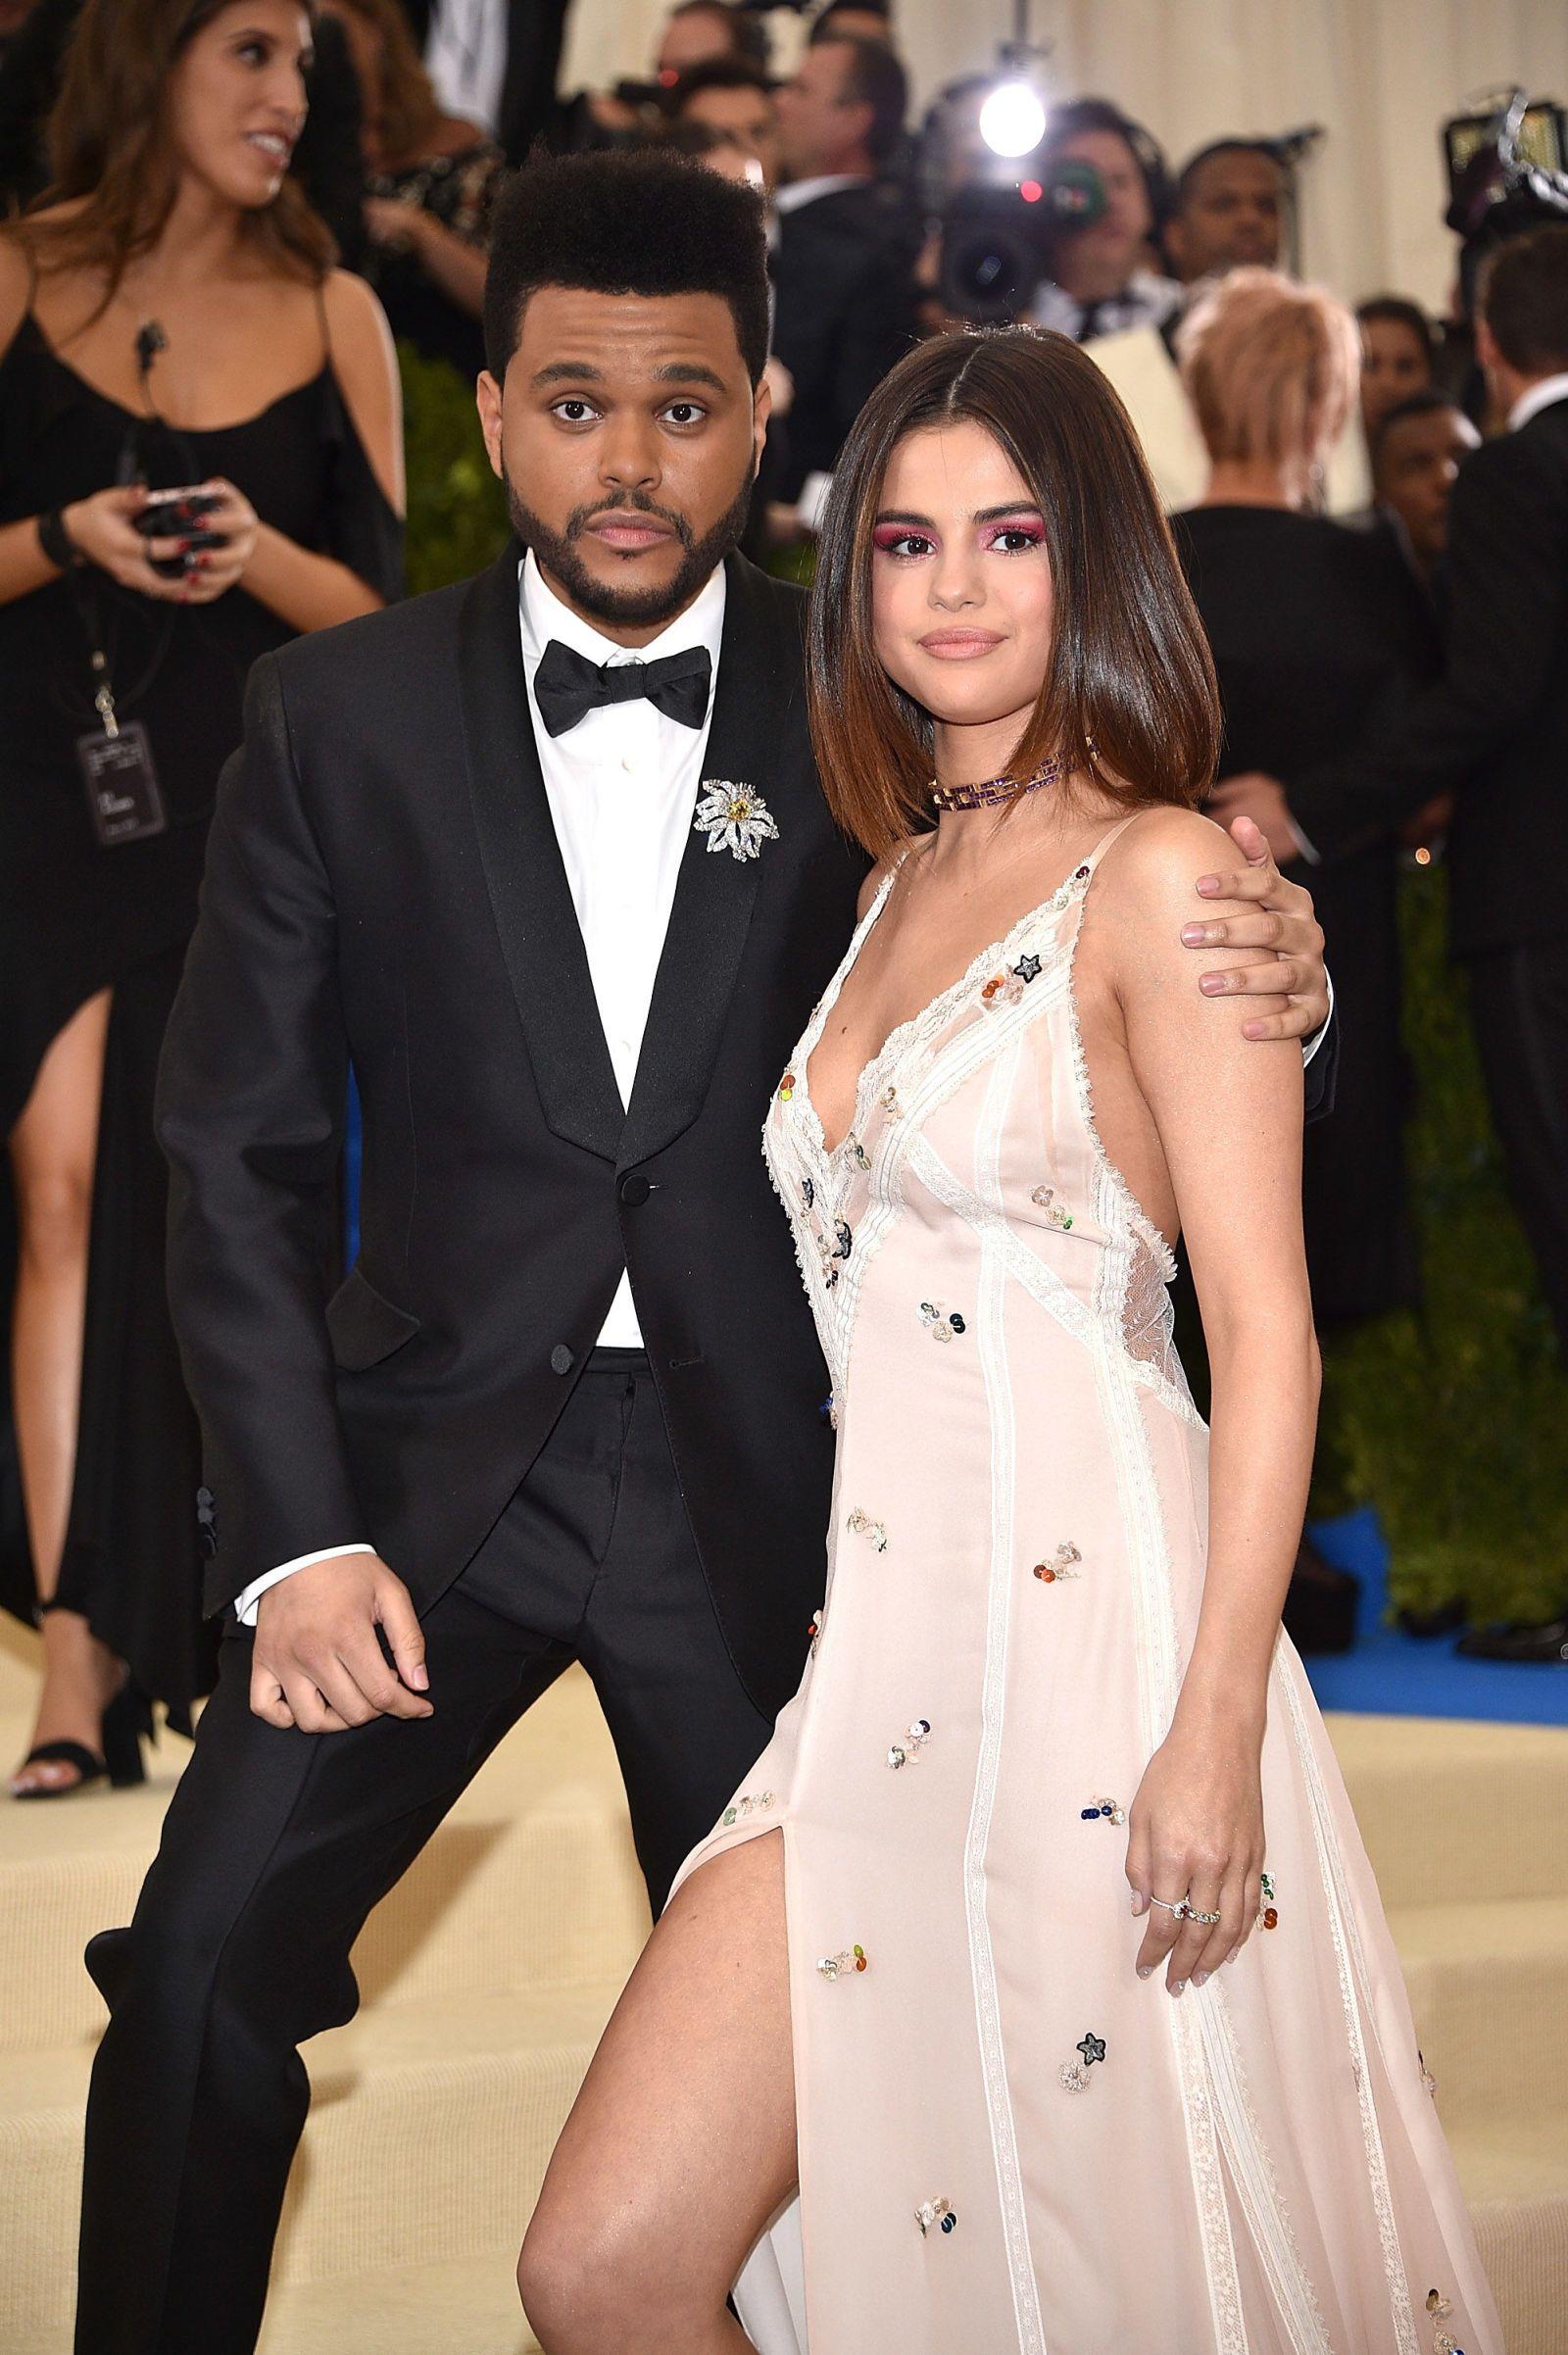 OS Selena Gomez dating Zedd